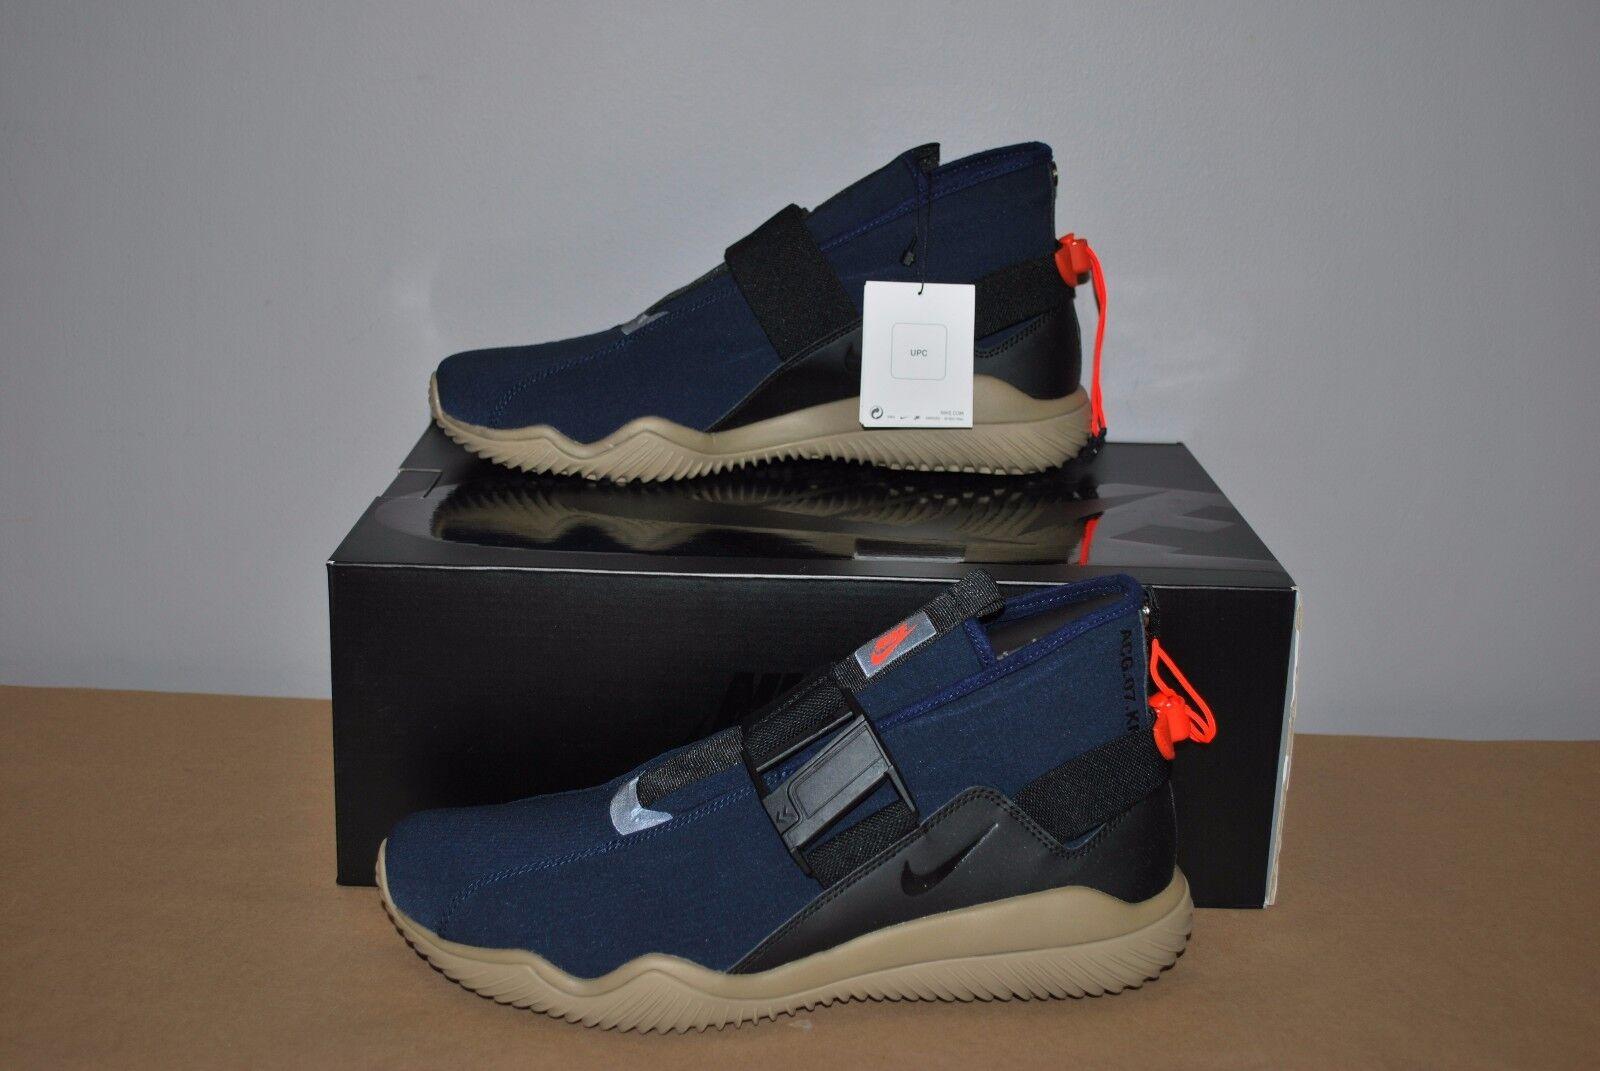 Nike nikelab / acg 07 kmtr komyuter obsidian / nikelab schwarze khaki 902776-401 - größe. 8b4f34